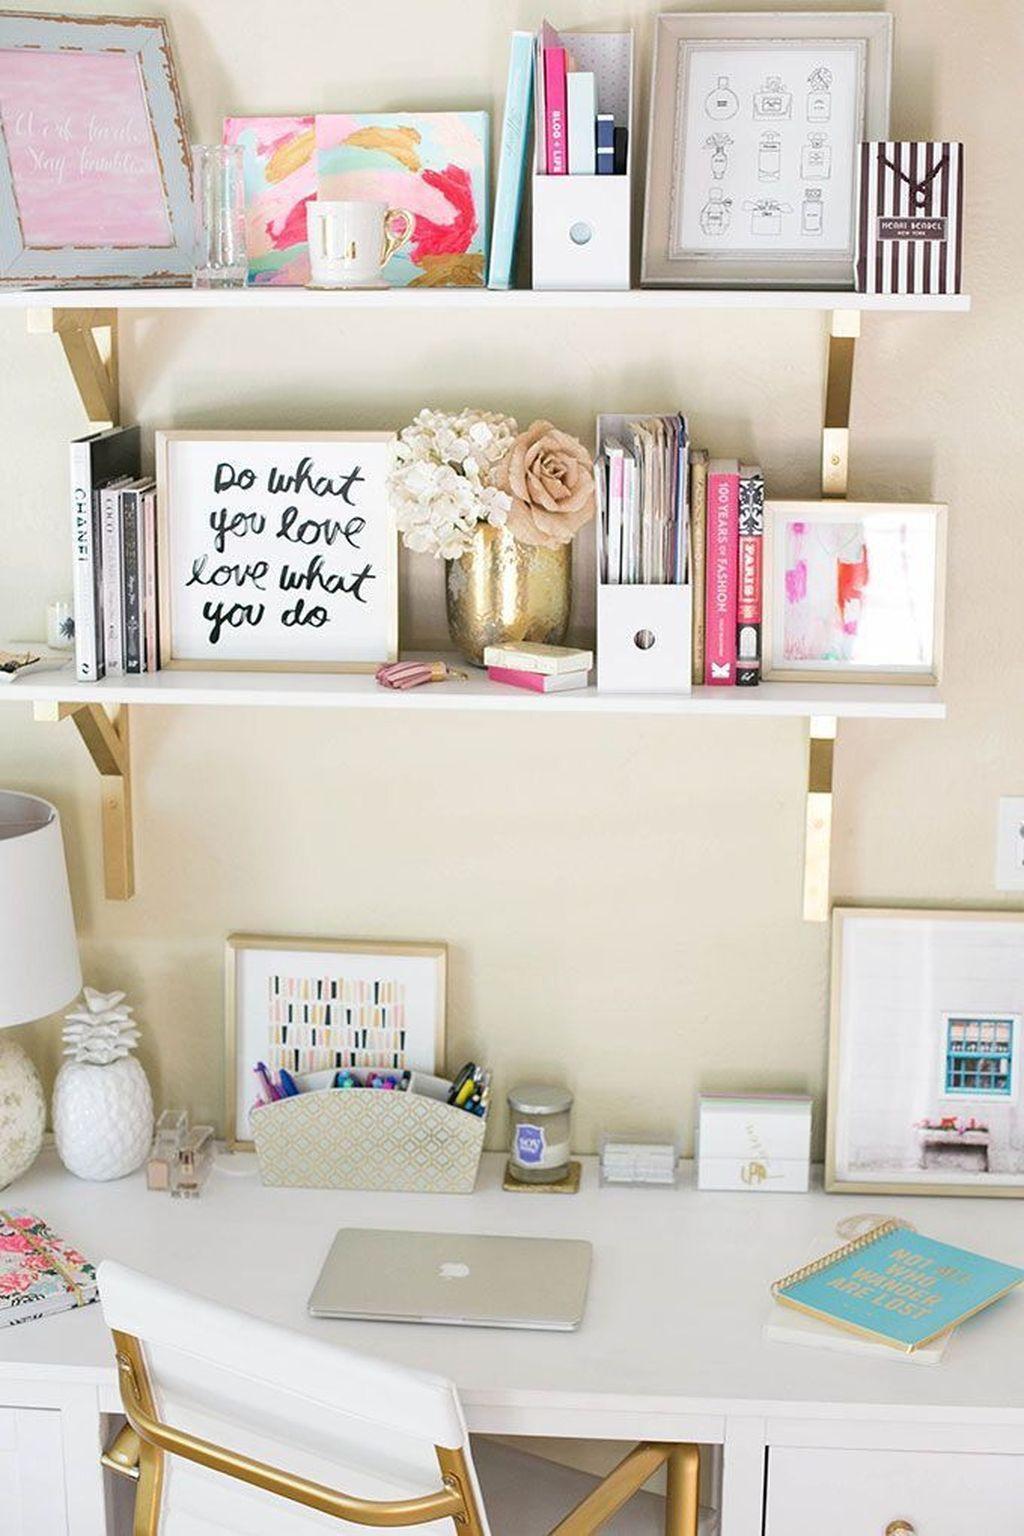 Inspiring Office Cubicle Decoration Ideas 36 Cubicle Decor Dorm Room Diy Cubicle Decor Office